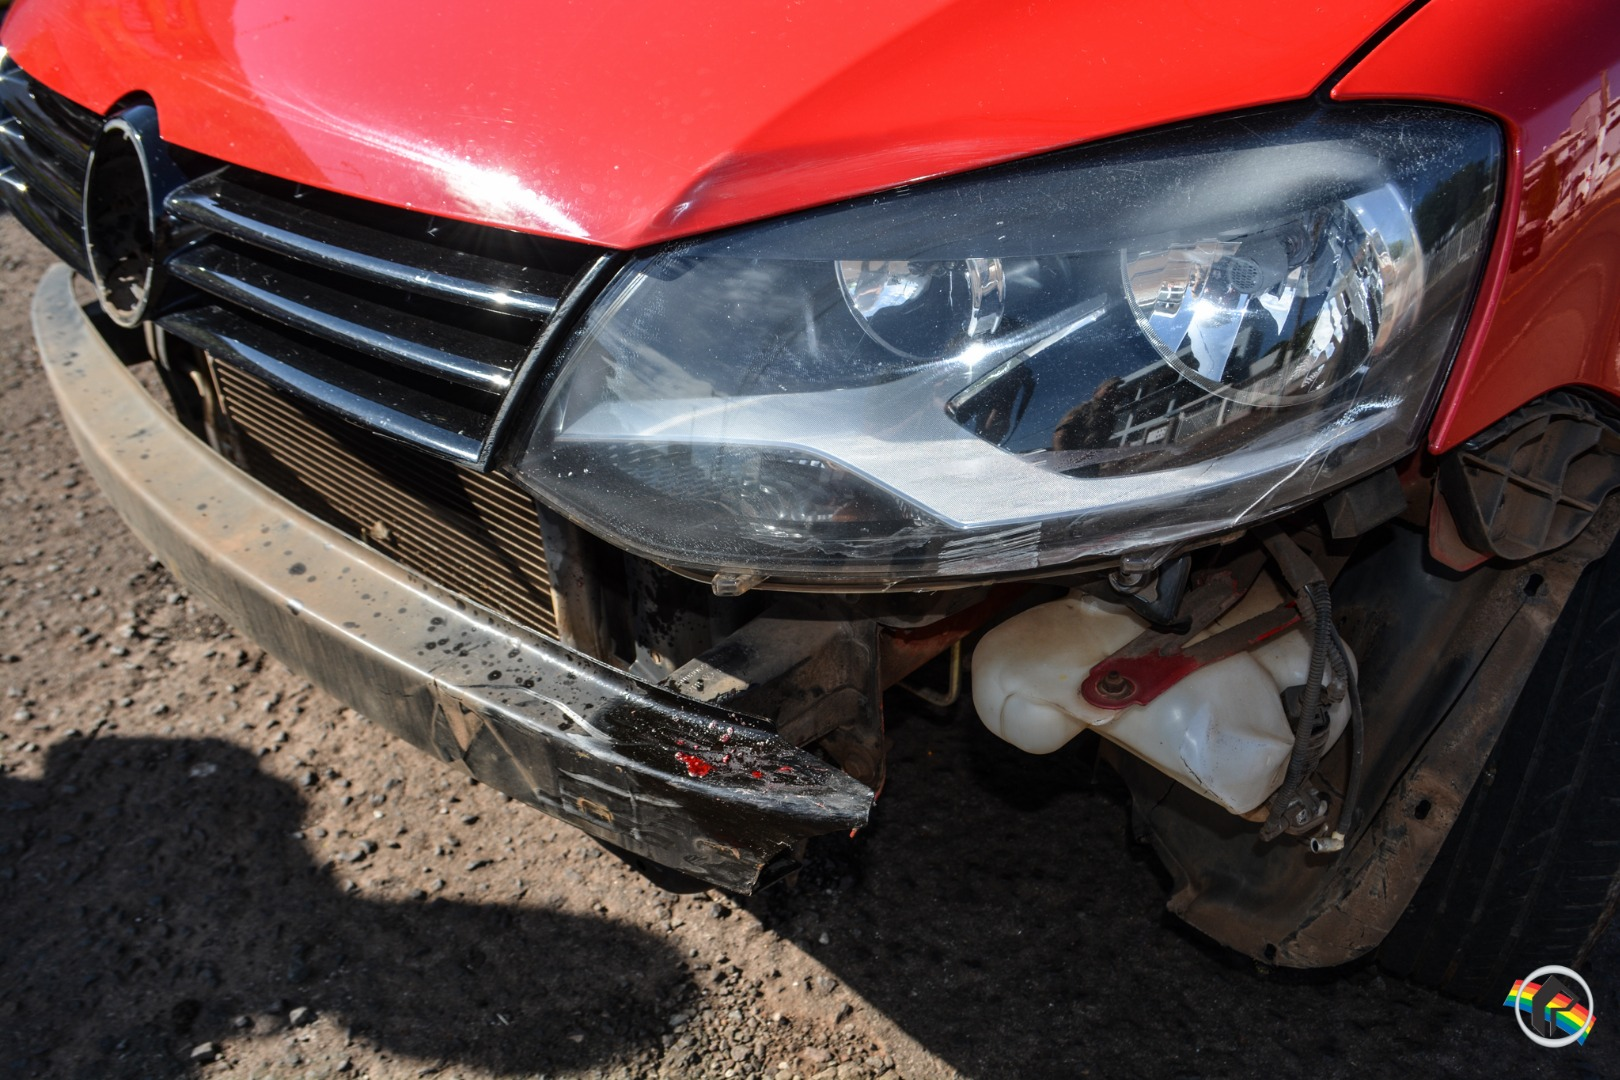 VÍDEO: Rapaz fica gravemente ferido ao ter frente cortada por carro